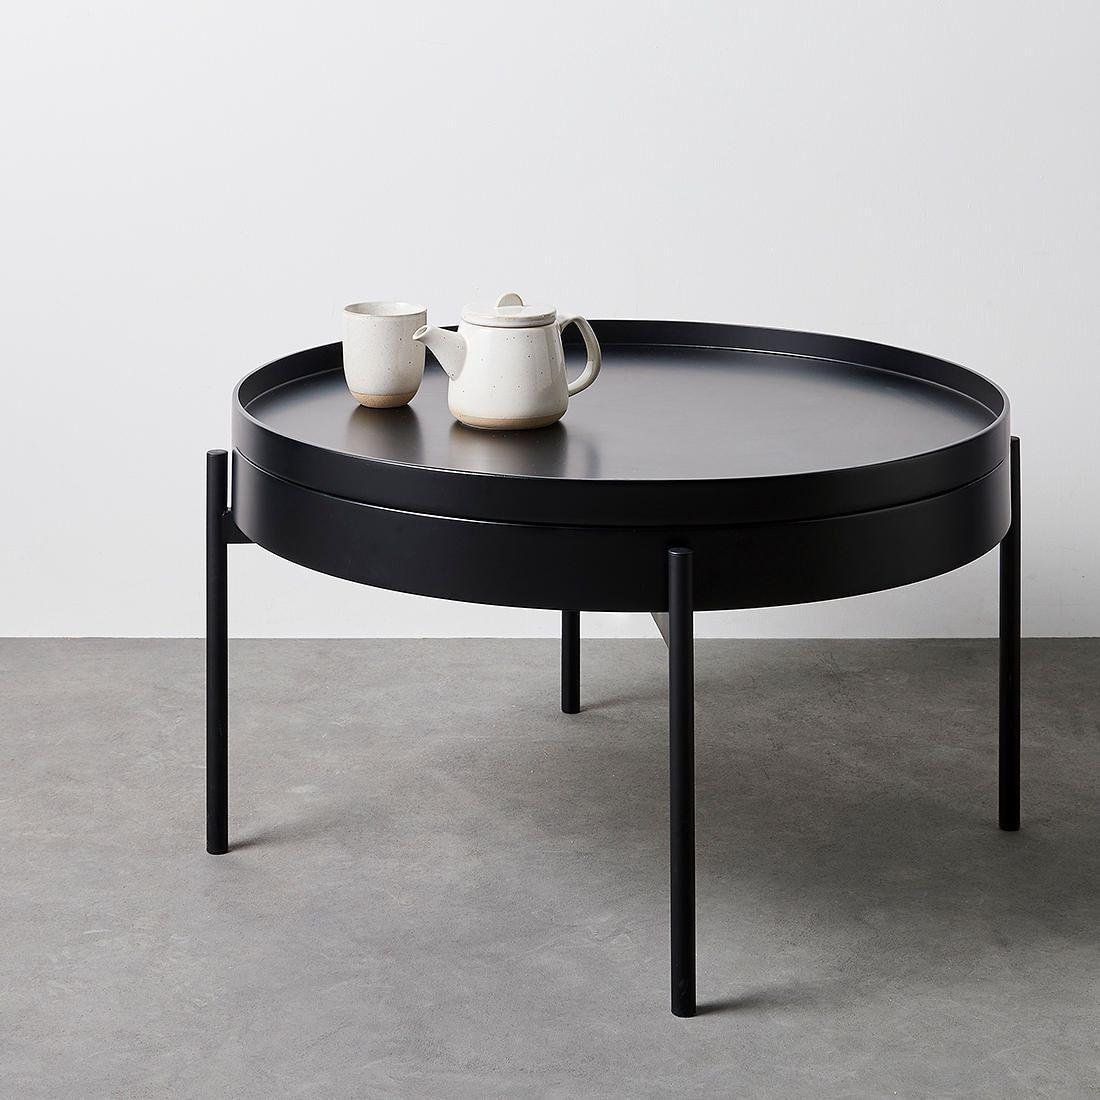 Maddox Coffee Table Target Australia Coffee Table Black Coffee Tables Table [ 1100 x 1100 Pixel ]